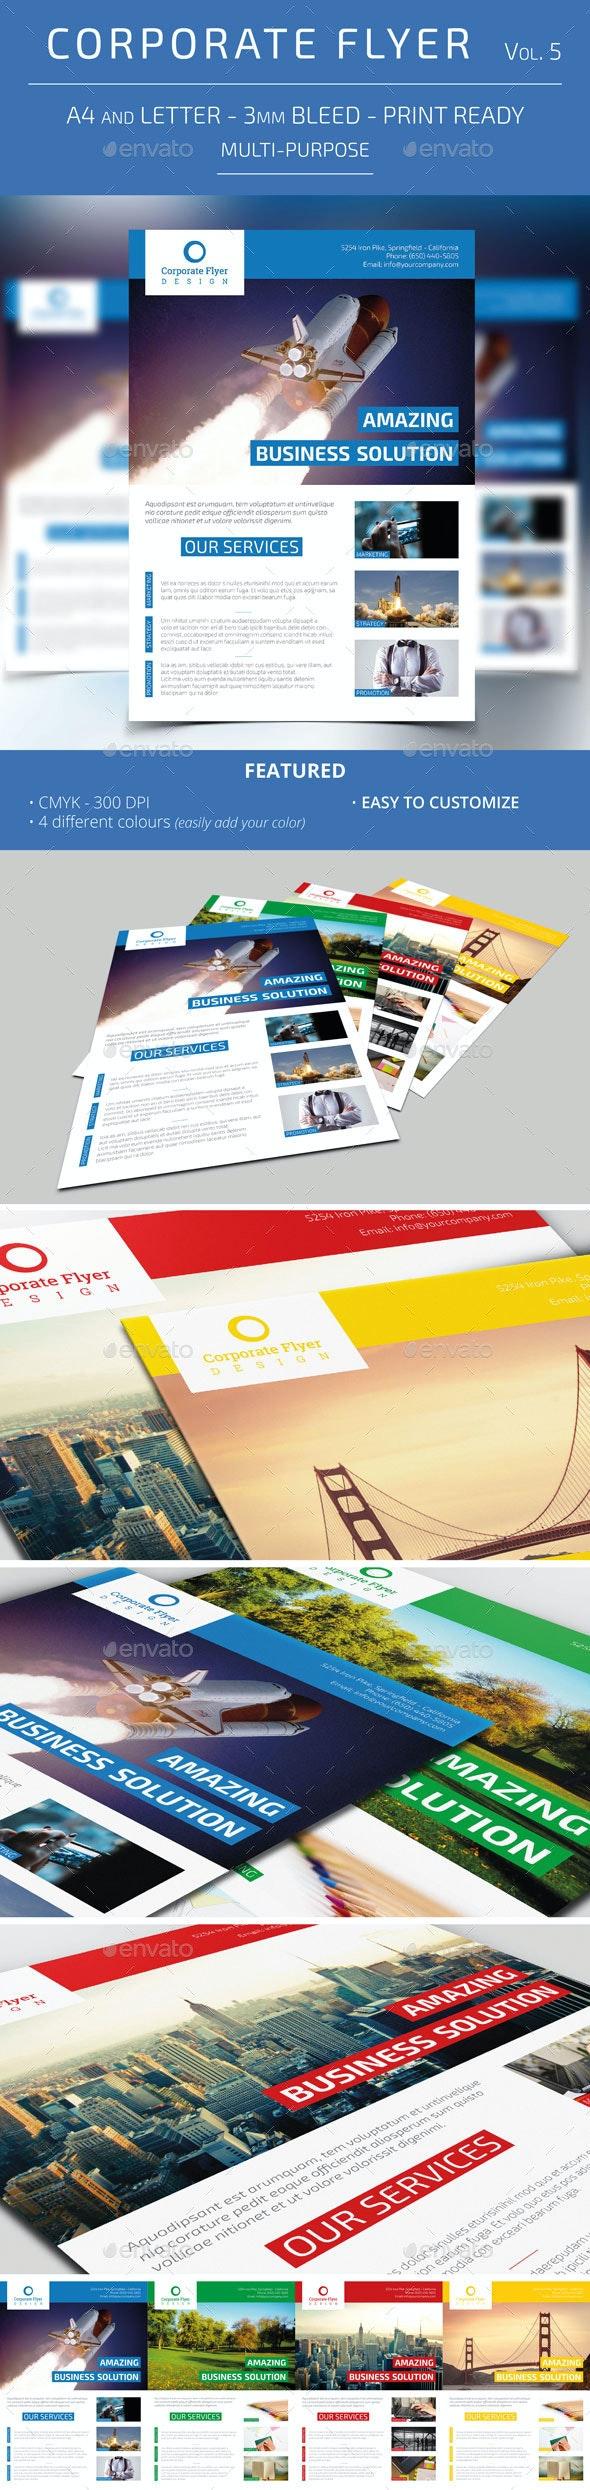 Corporate Flyer - Vol. 5 - Corporate Flyers